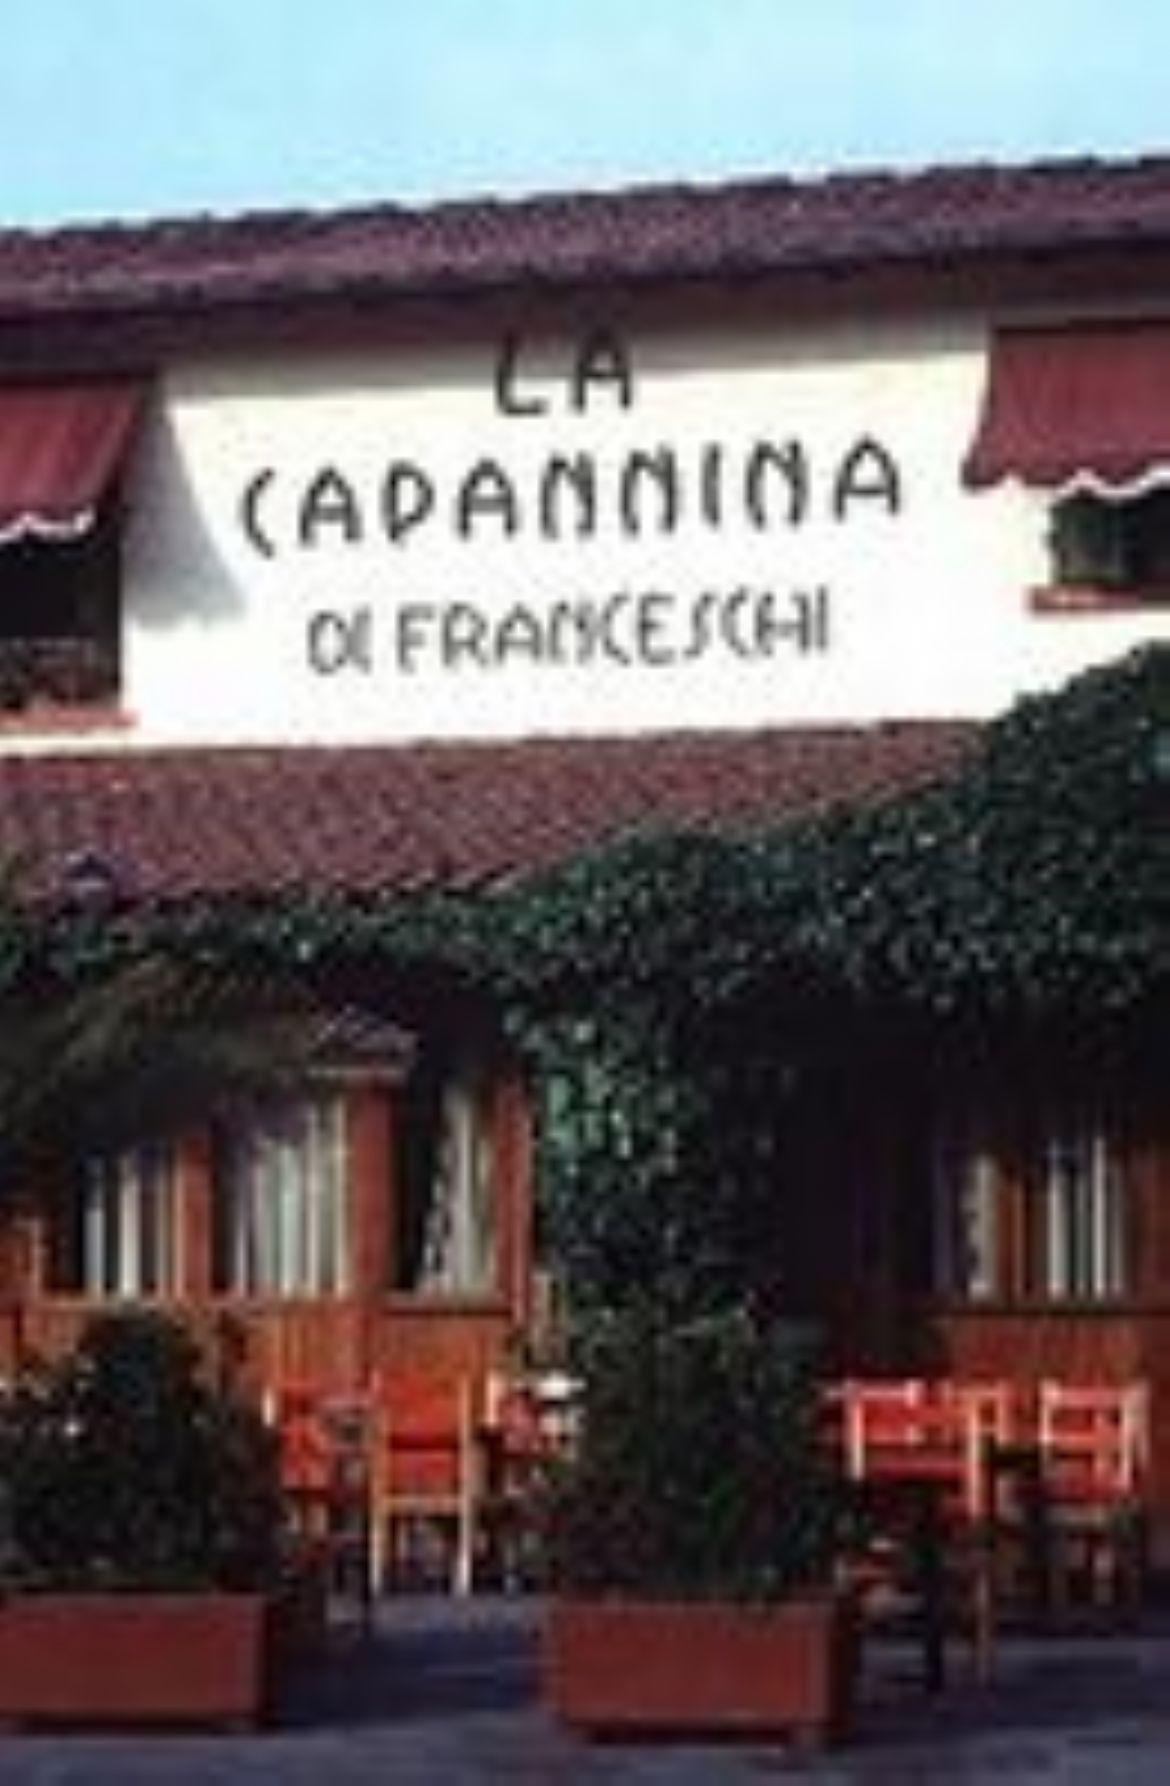 Capannina Di Franceschi - Tra i più famosi locali Italiani